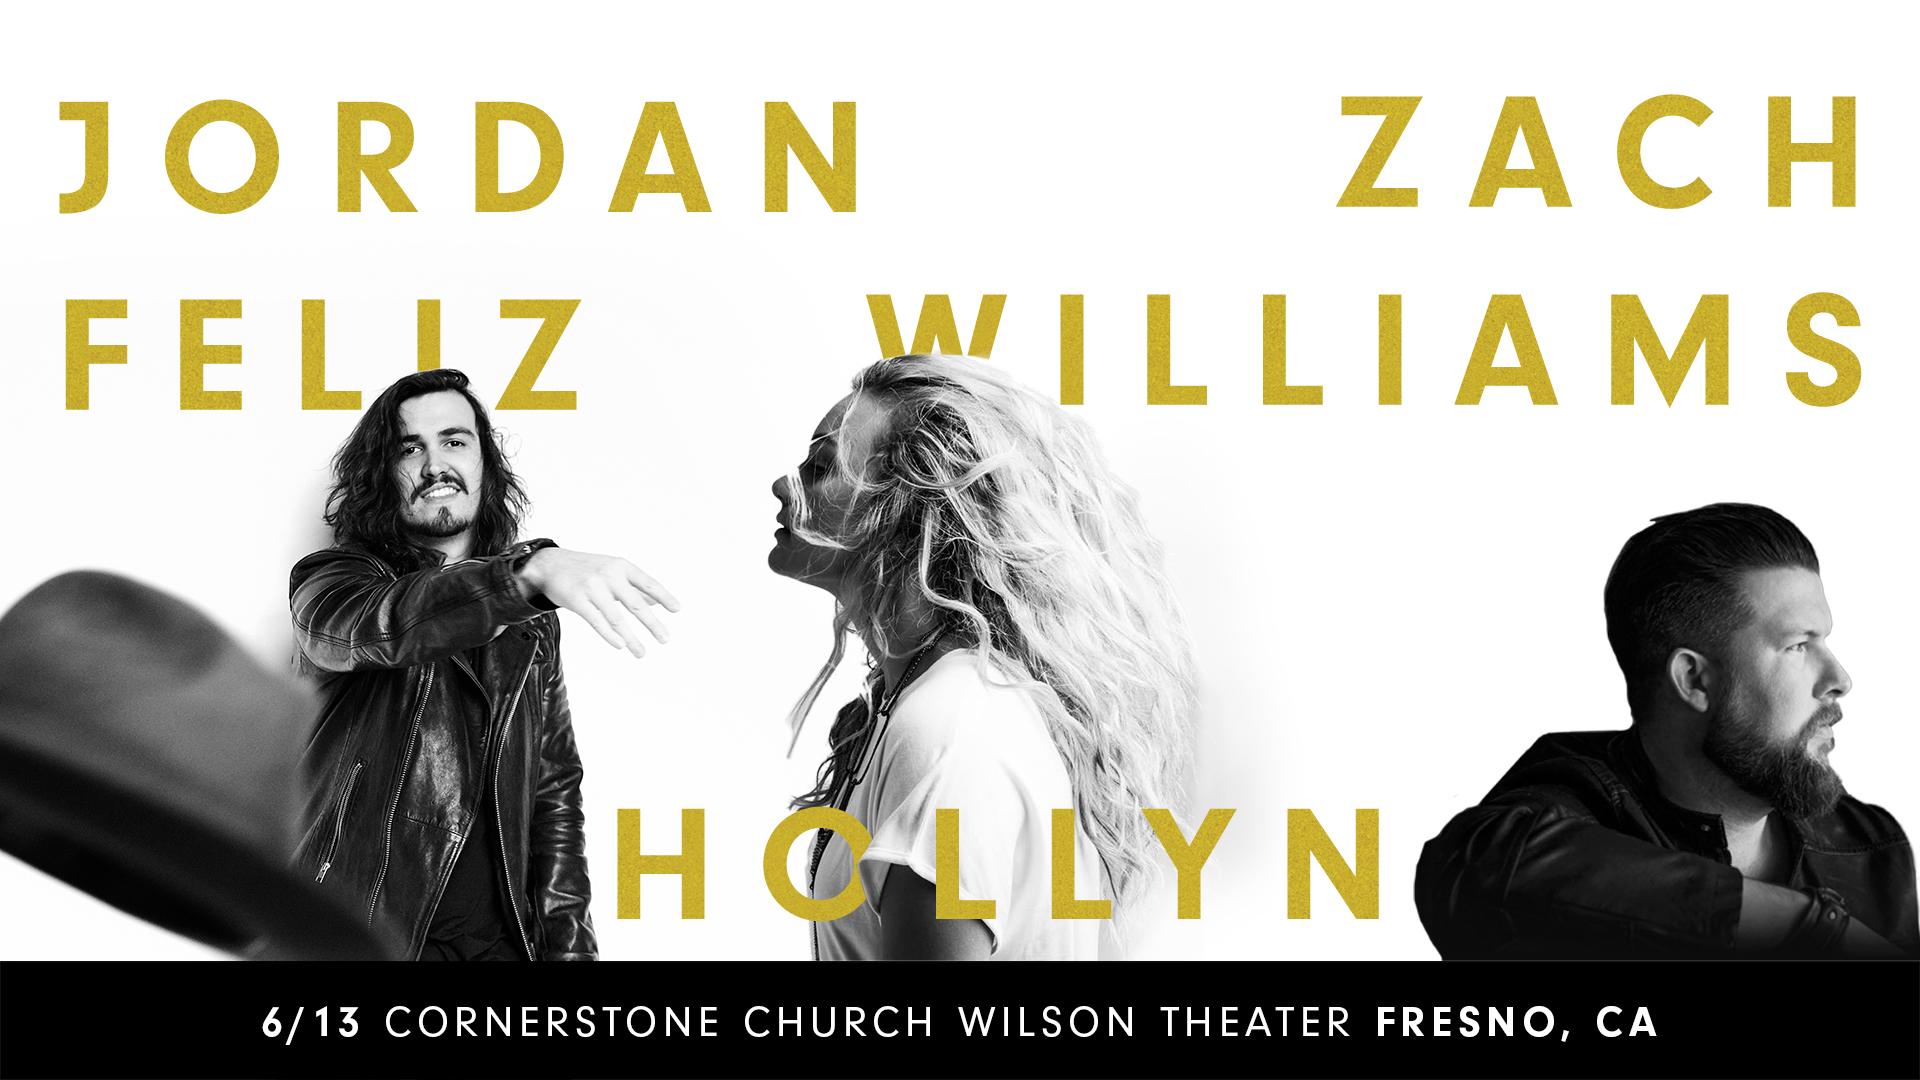 Jordan Feliz, Zach Williams, and Hollyn - Spirit 88 9 & 100 1